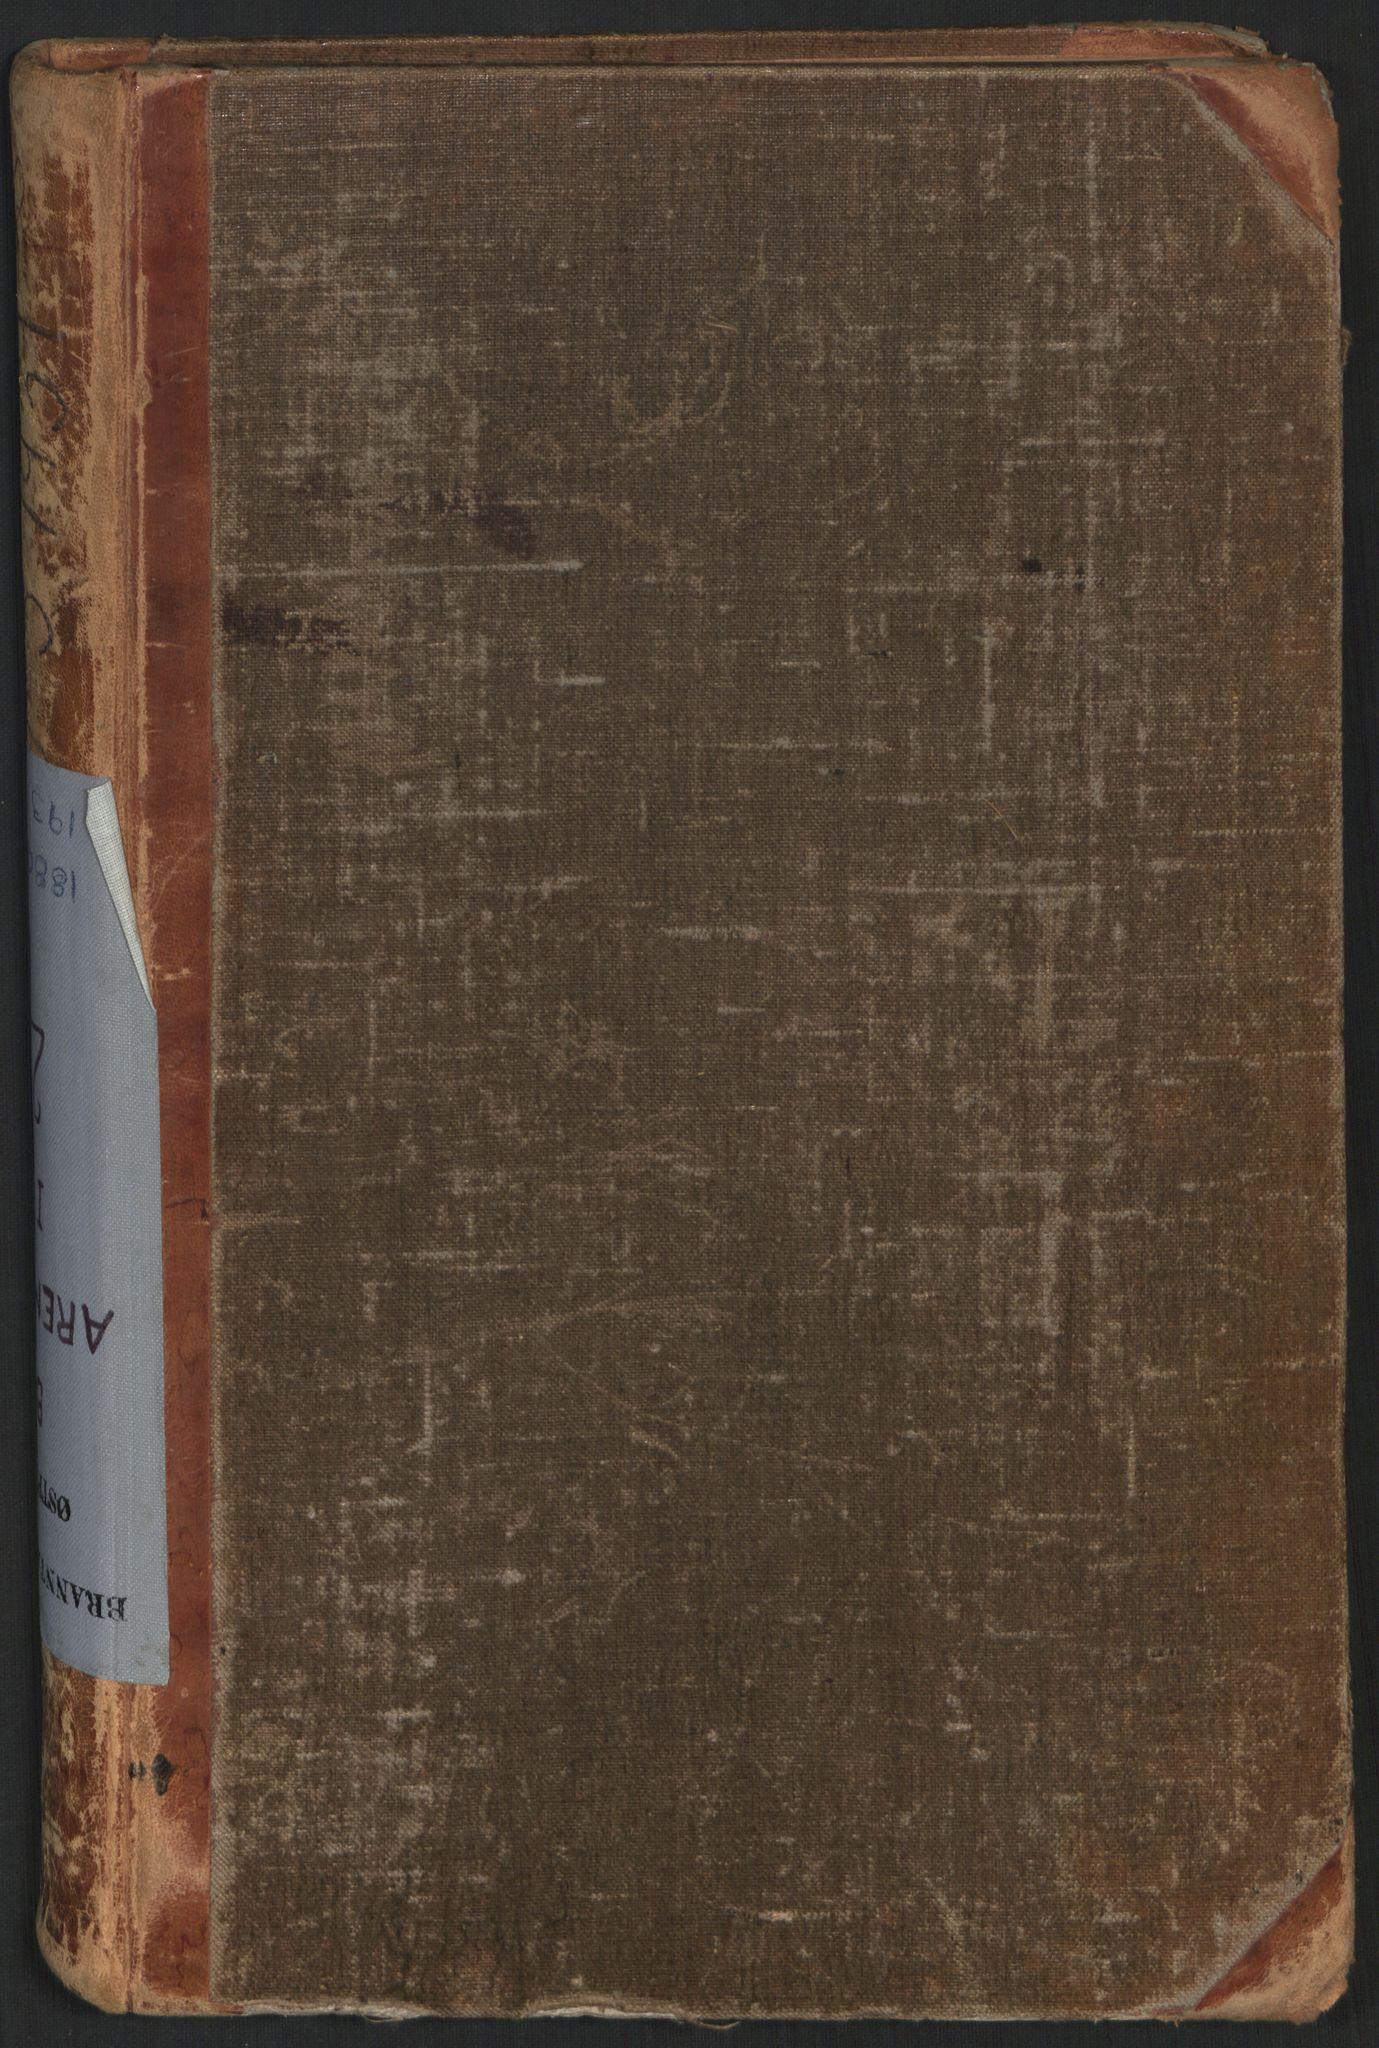 SAO, Norges brannkasse, branntakster Aremark, F/Fa/L0002: Branntakstprotokoll I, 1880-1931